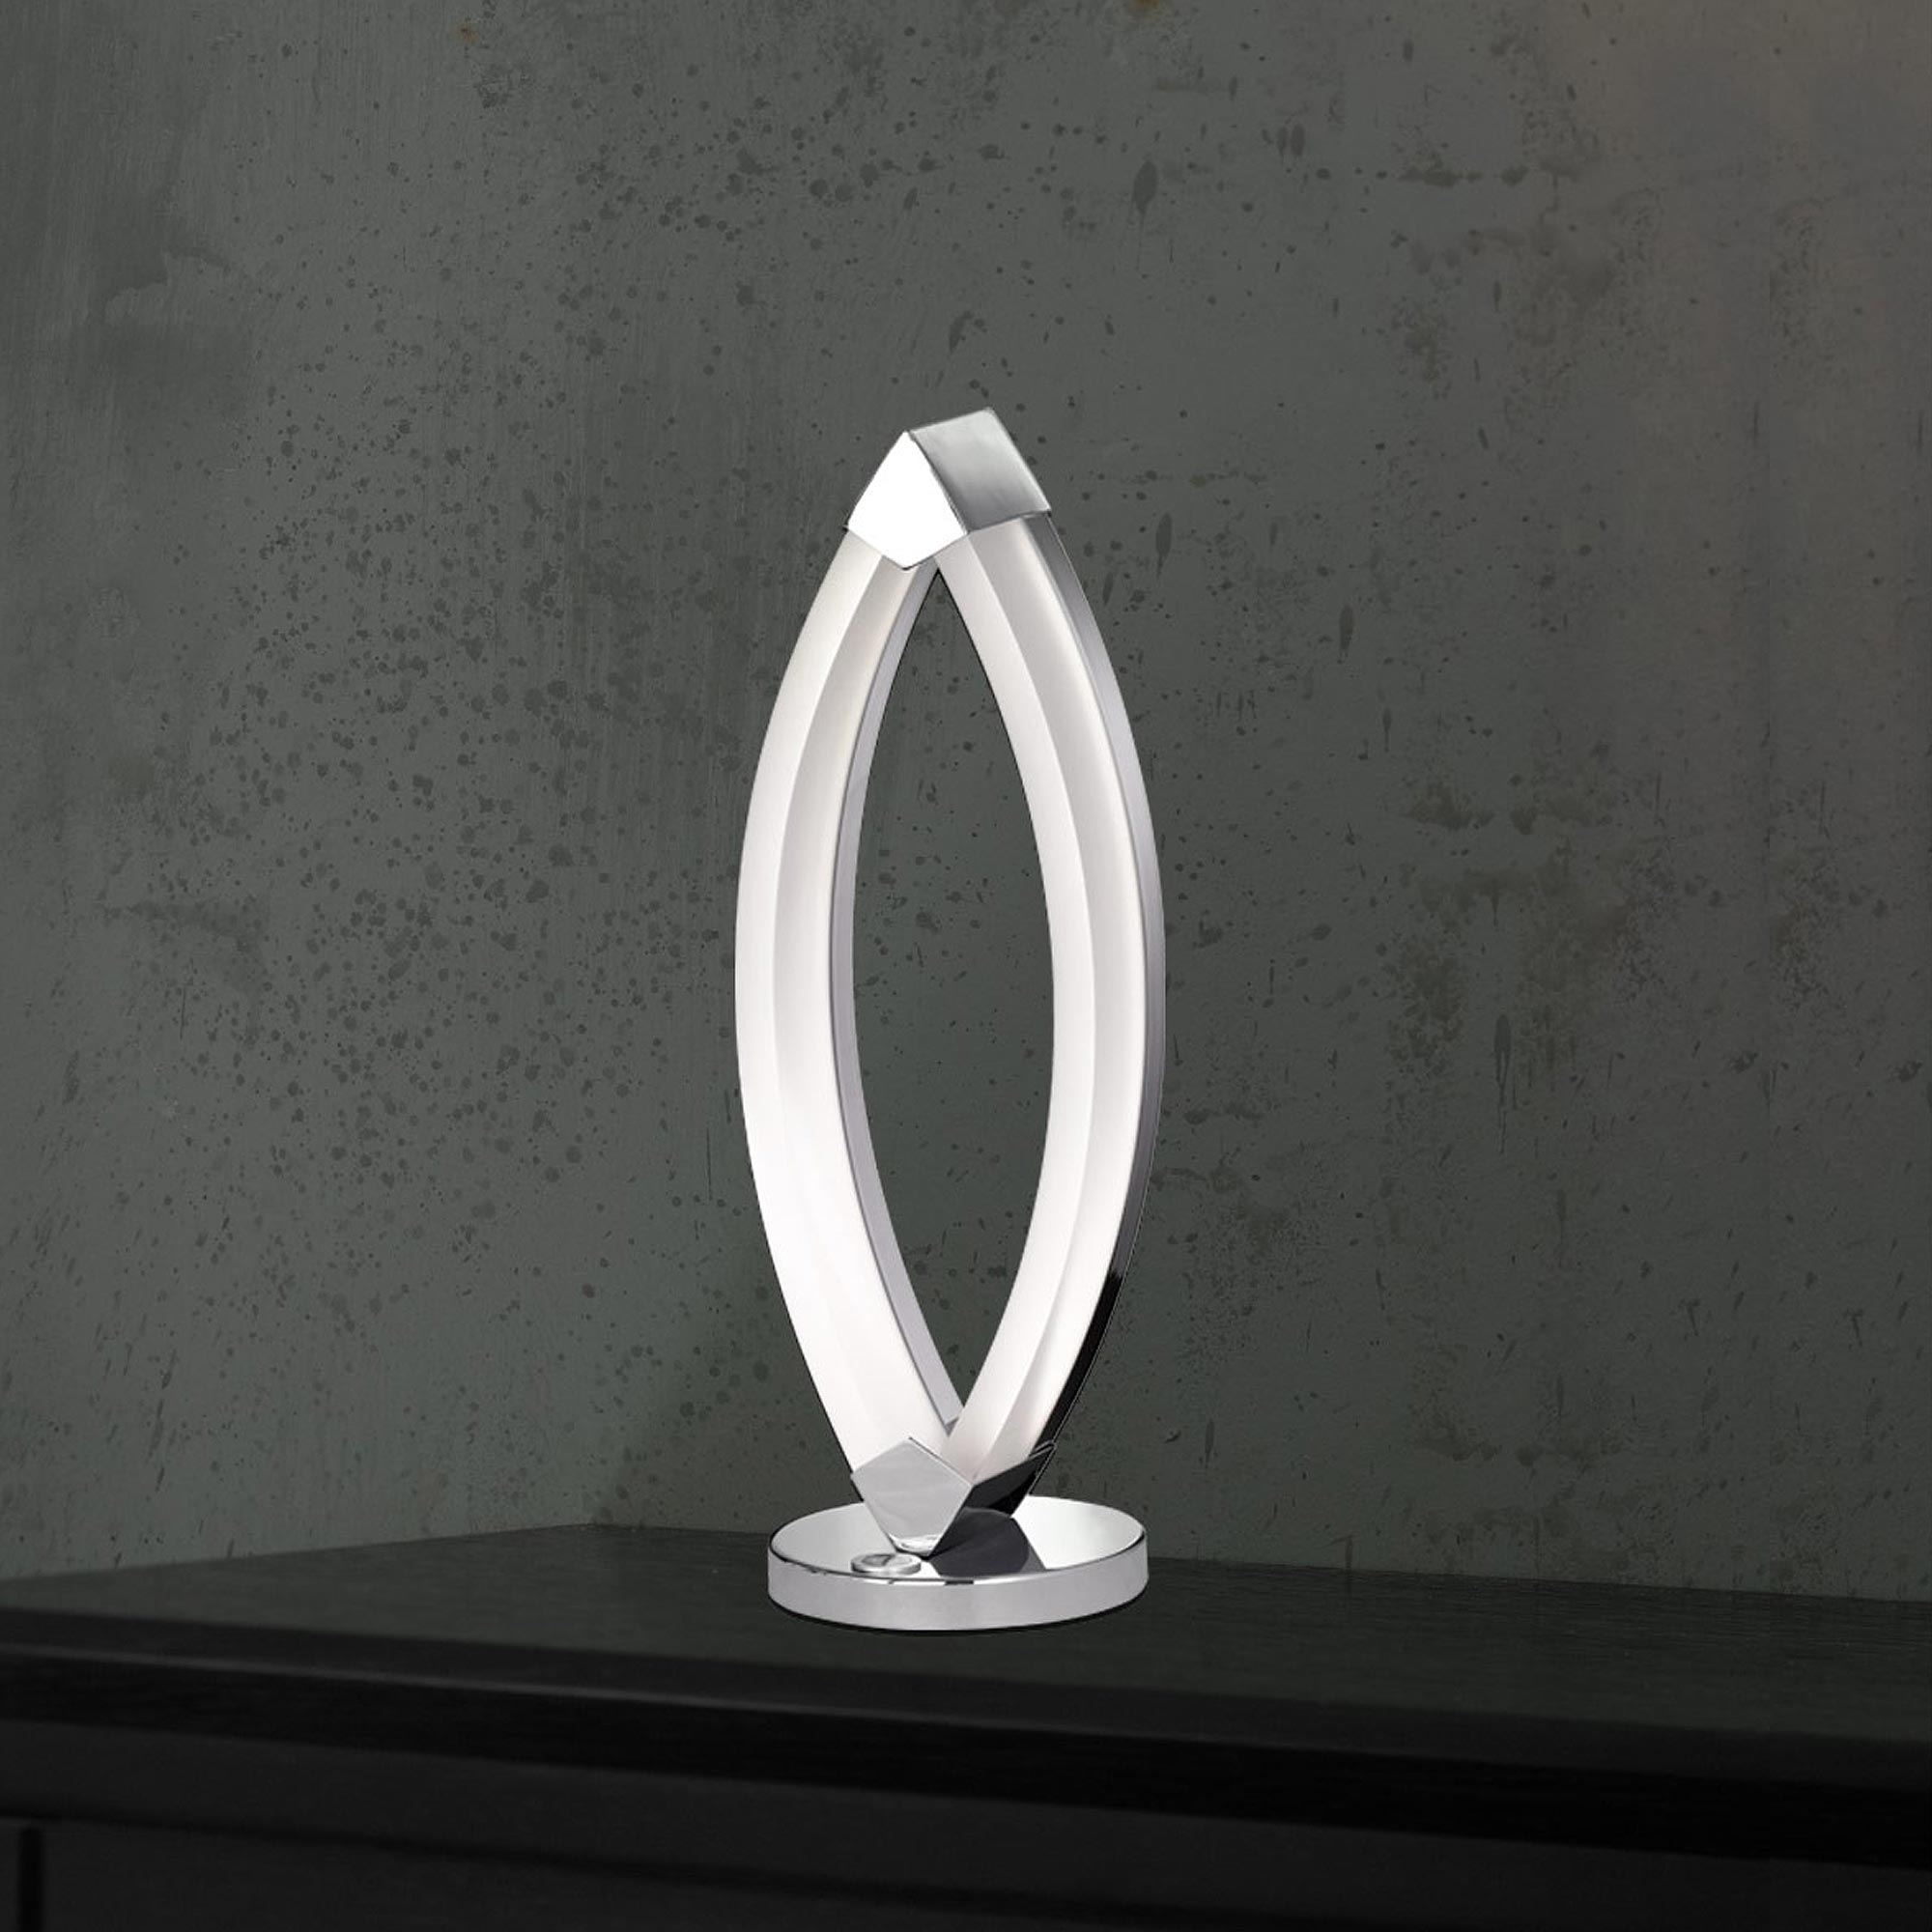 Wofi led tischleuchte vannes chrom 3 stufen touch dimmer for Moderne dekorationsartikel